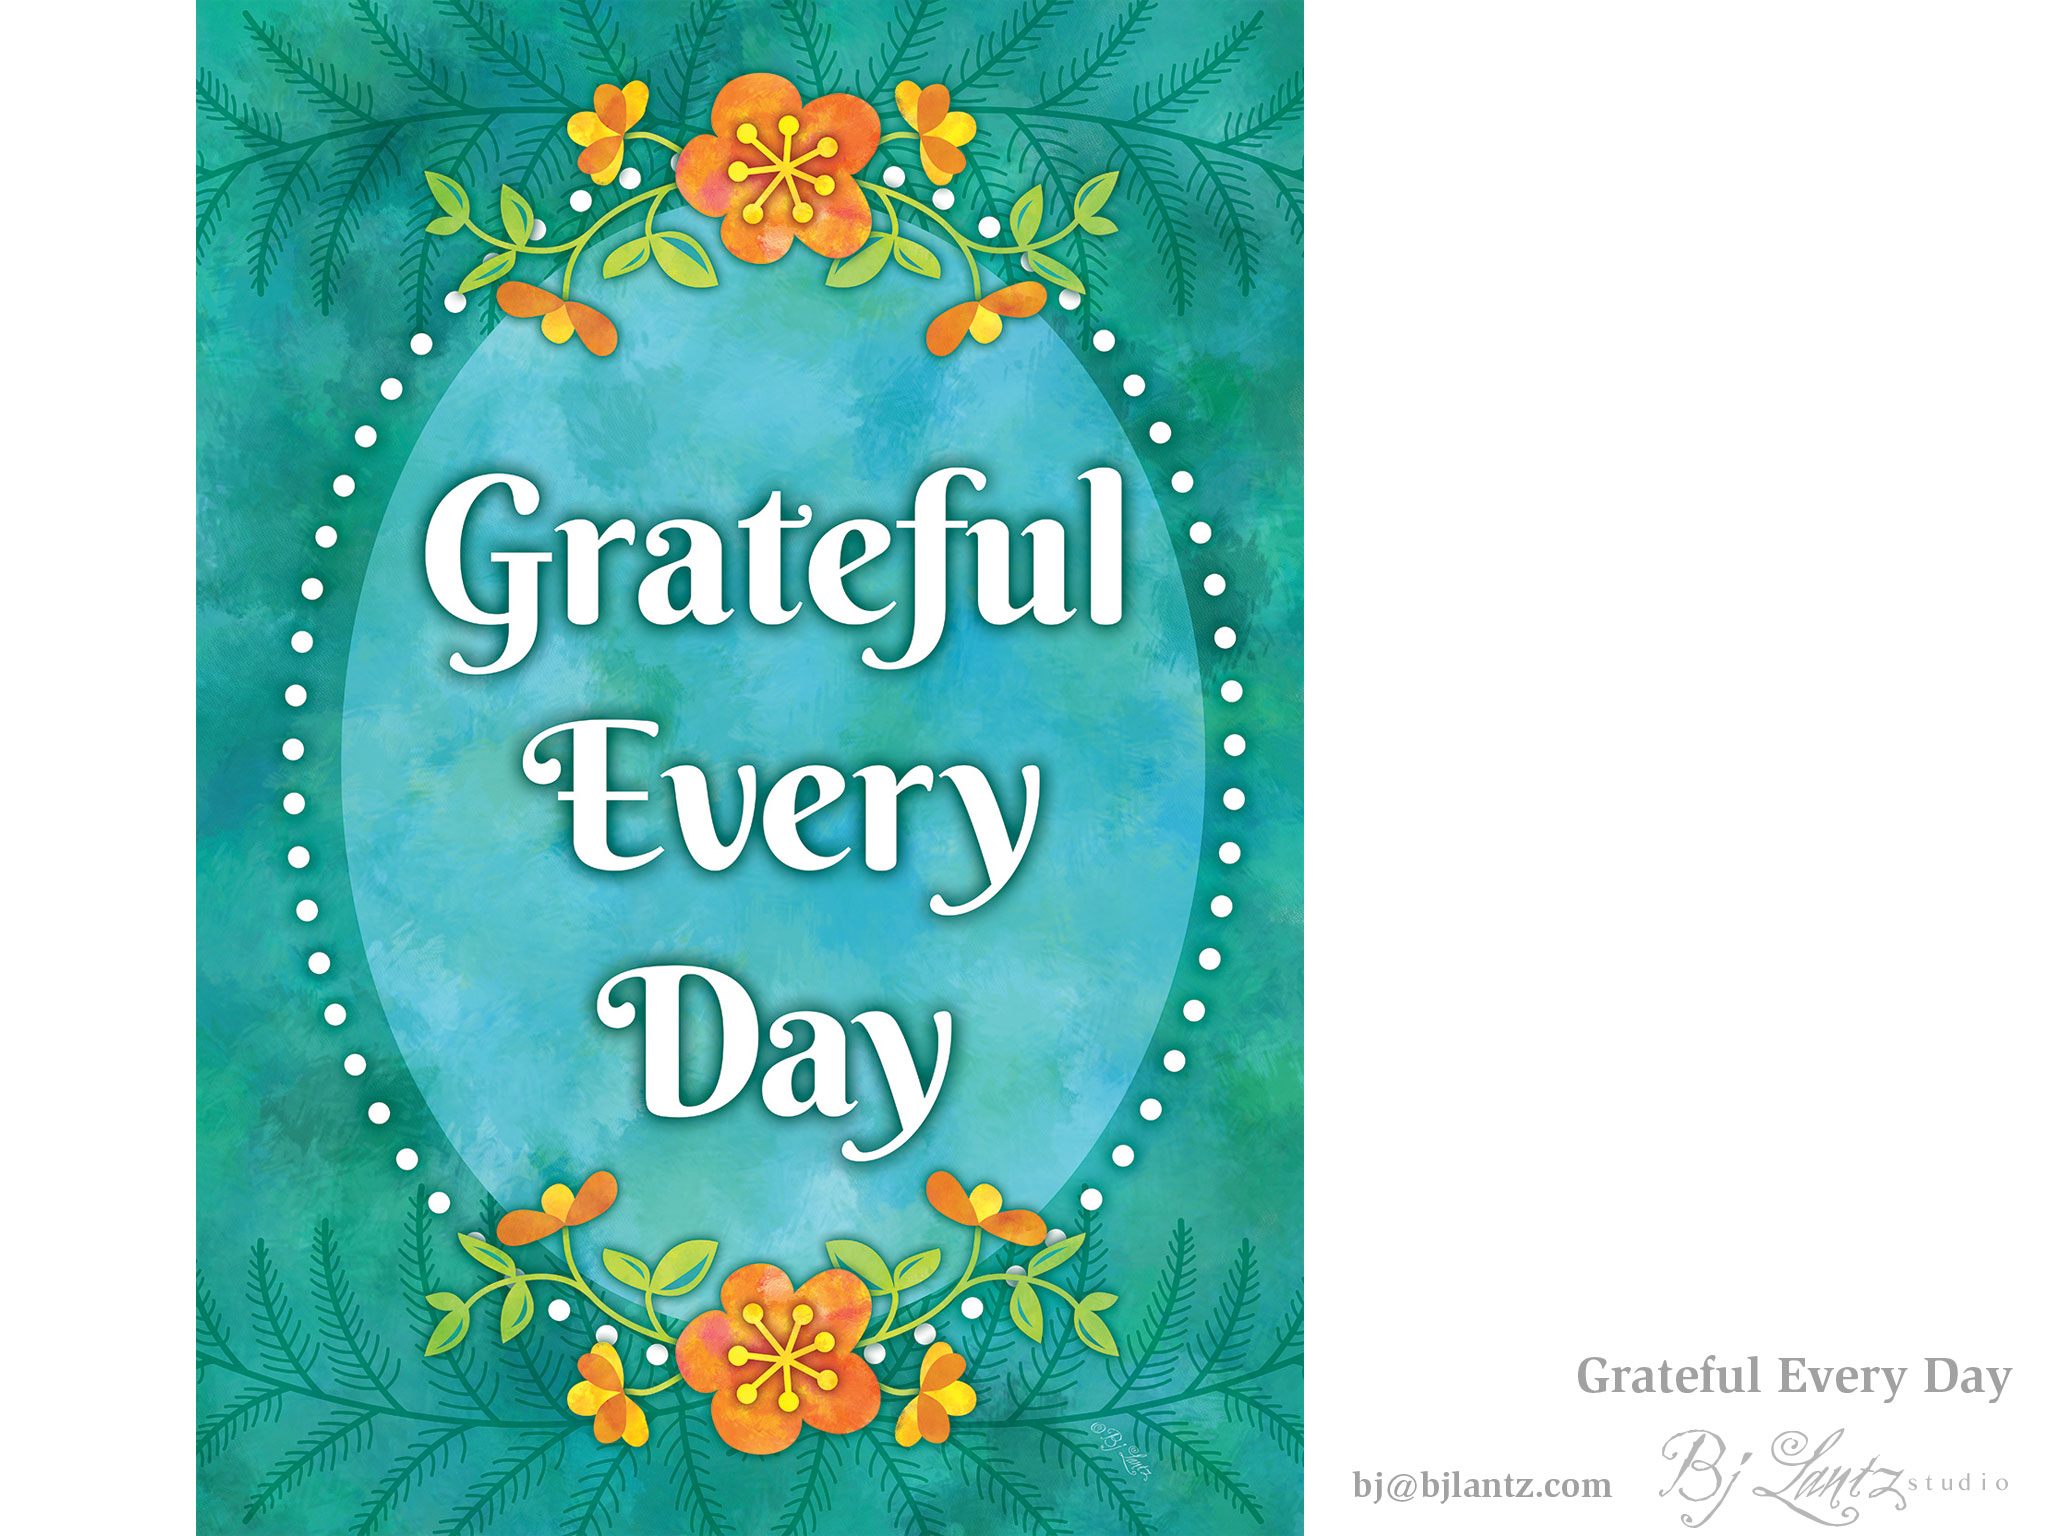 GratefulEveryDay_BJLantz_1.jpg